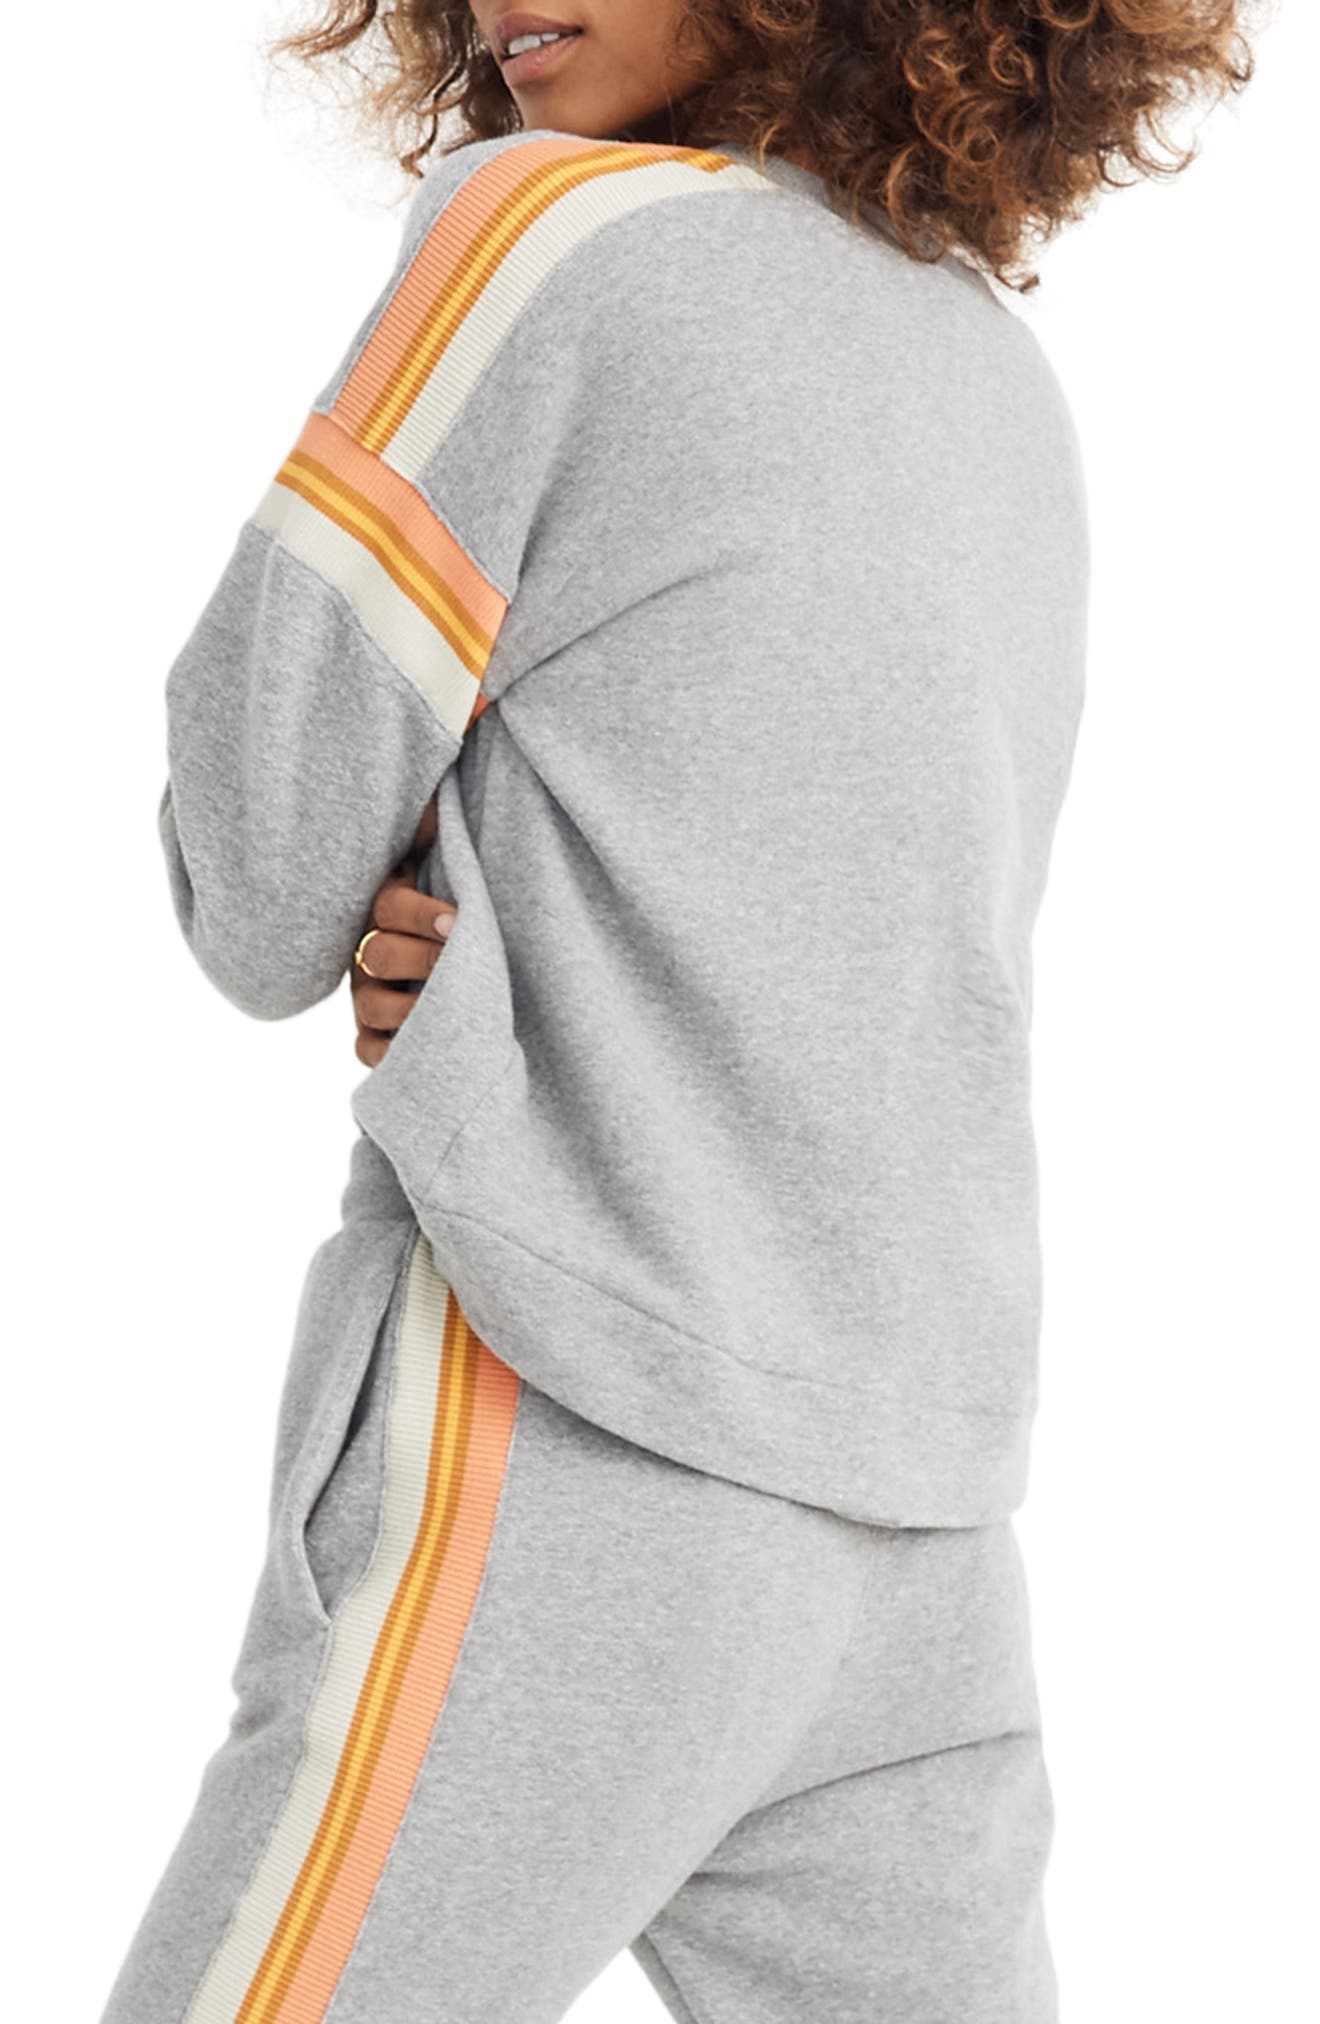 Madewell Stripe Inset Varsity Sweatshirt, Grey